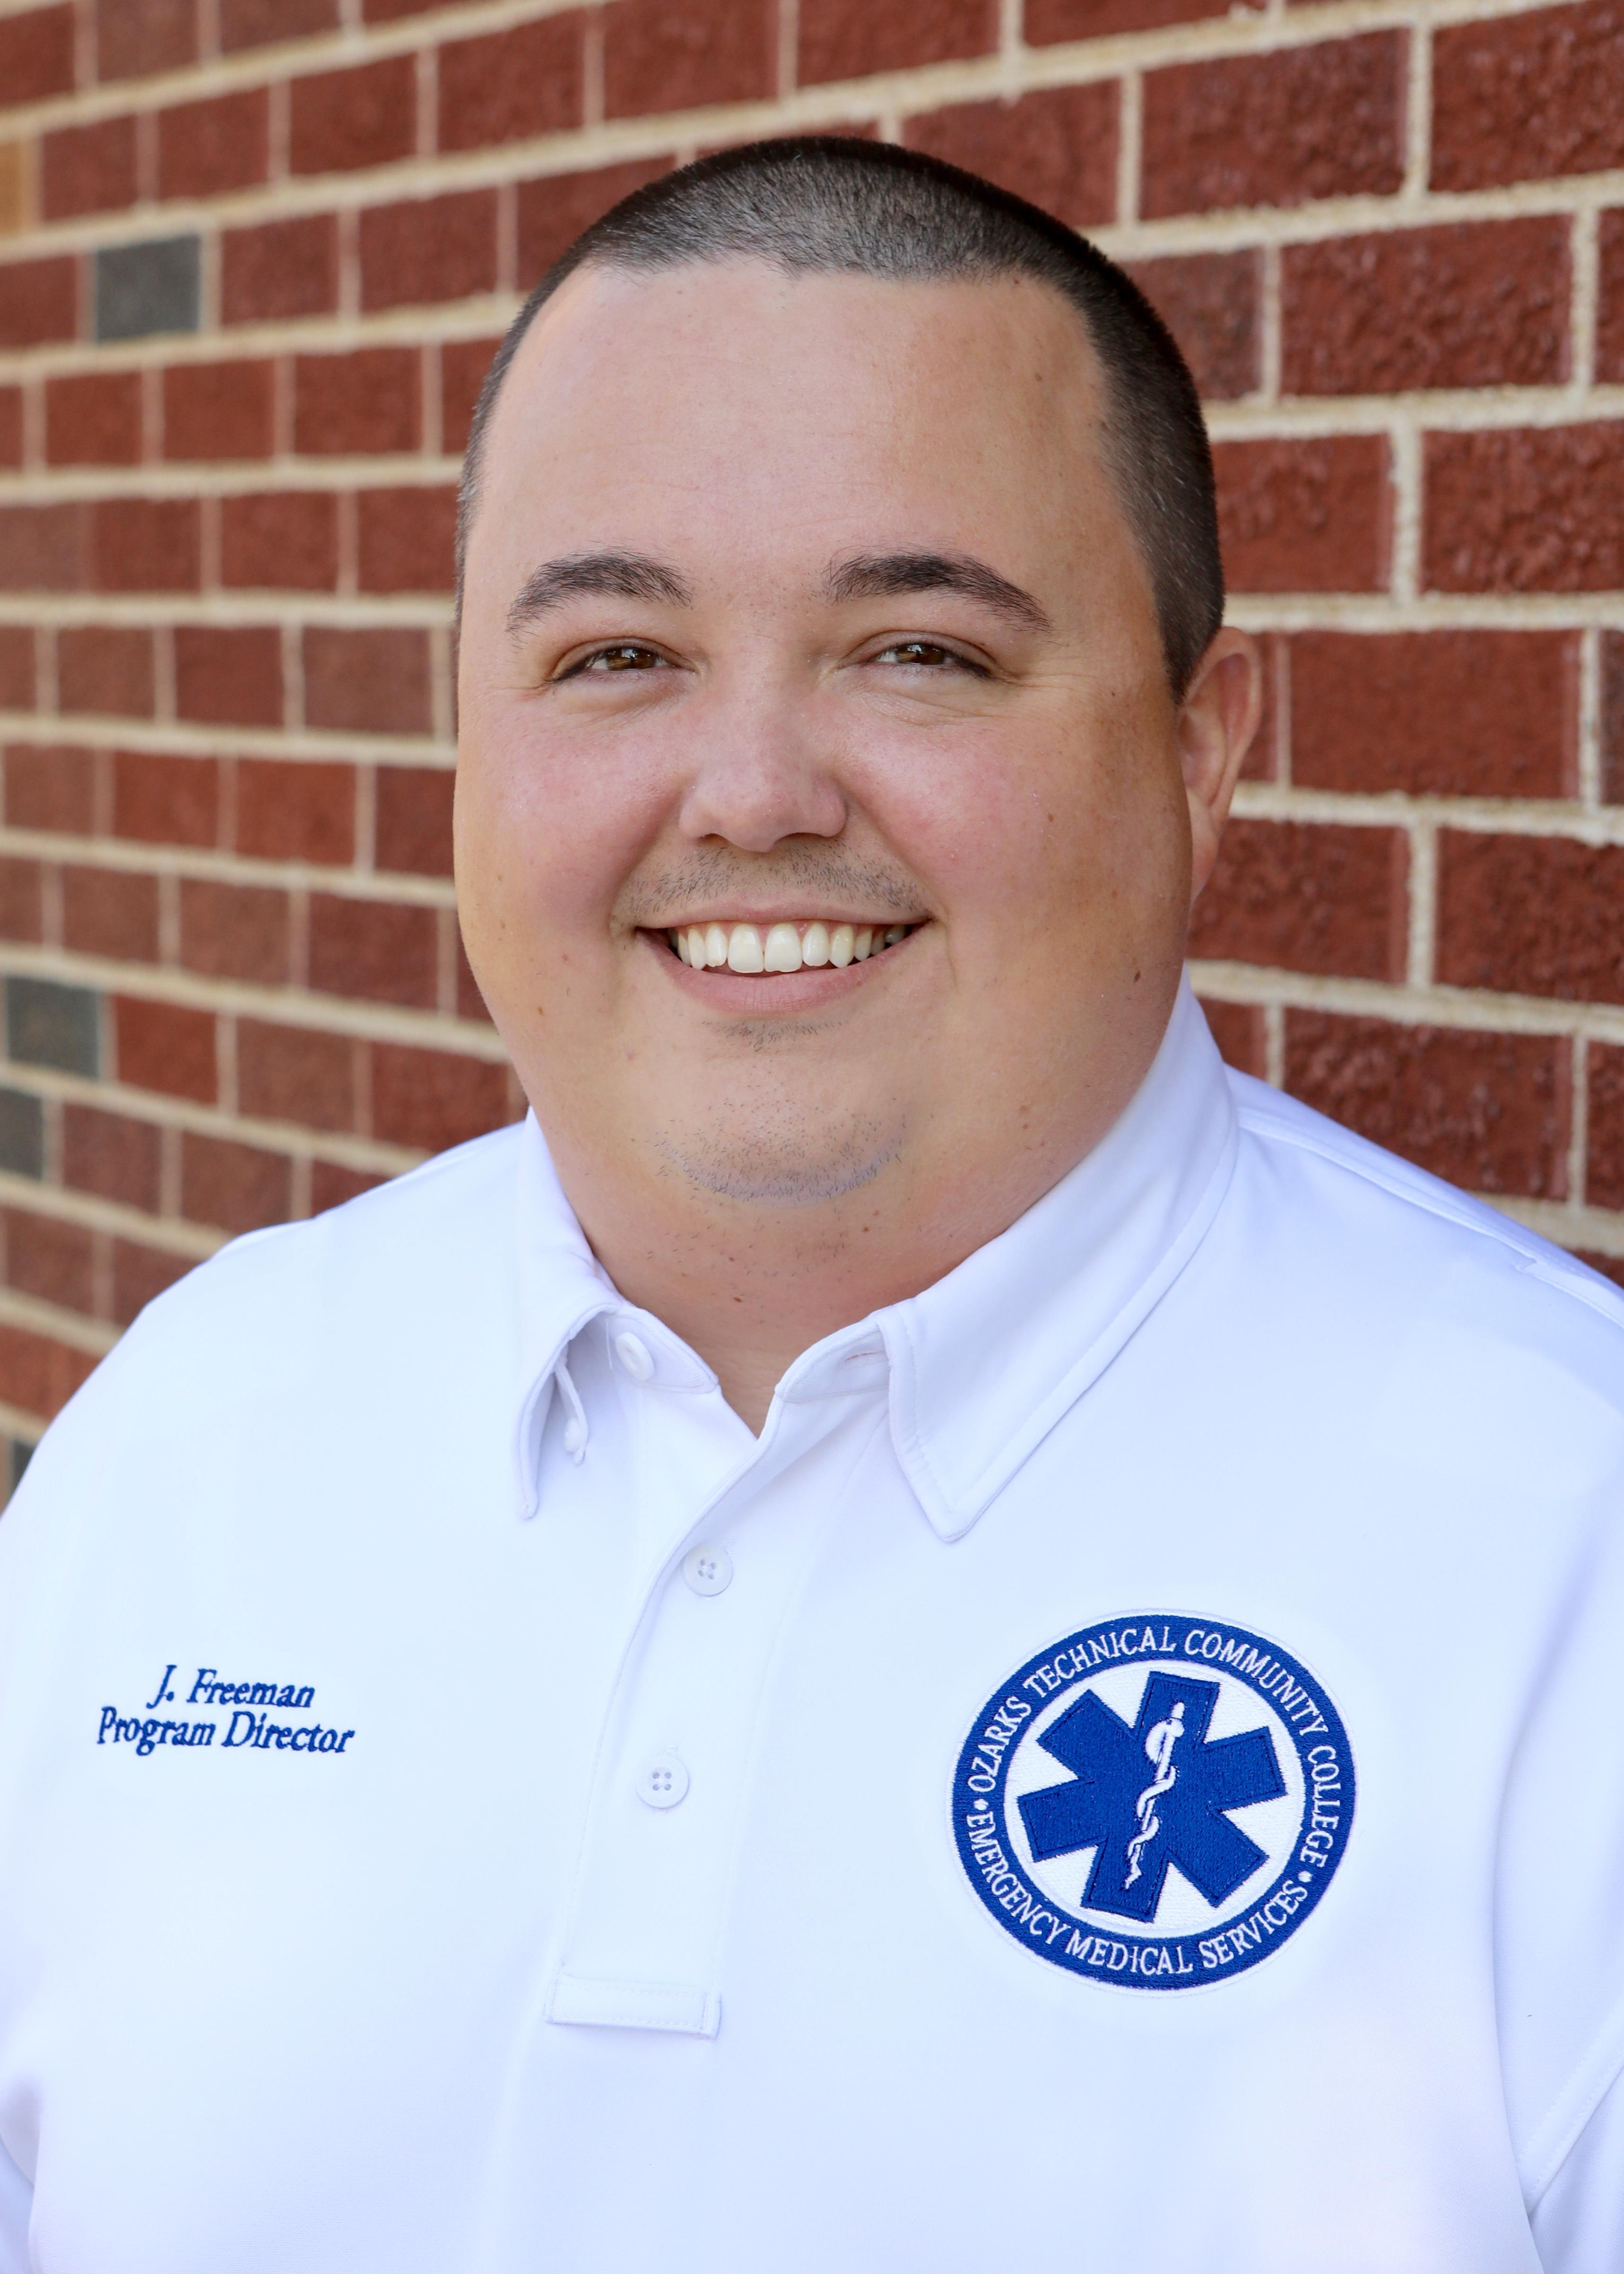 Josh Freeman, EMS program director